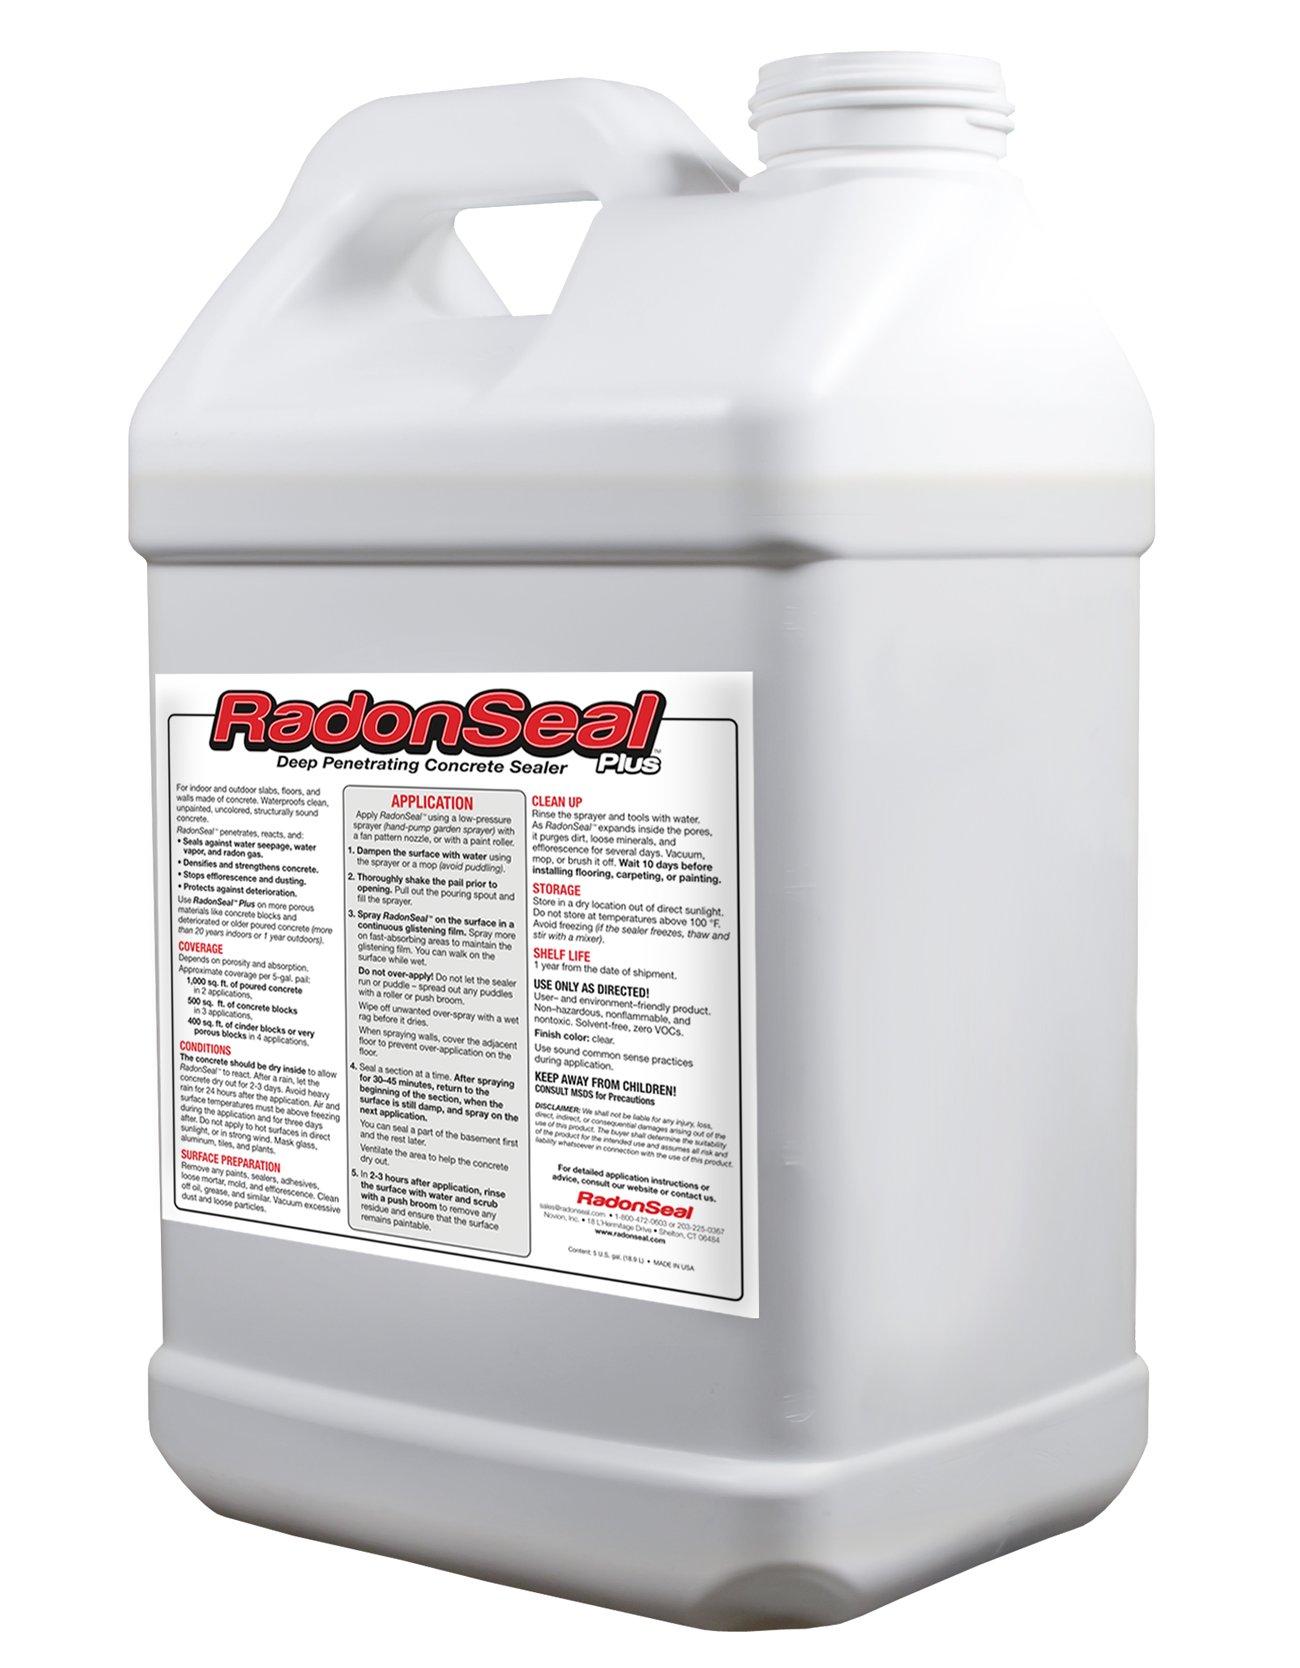 RadonSeal Plus Deep-Penetrating Concrete Sealer (2.5-gal) – Waterproofs, Strengthens, and Mitigates Concrete Permanently!